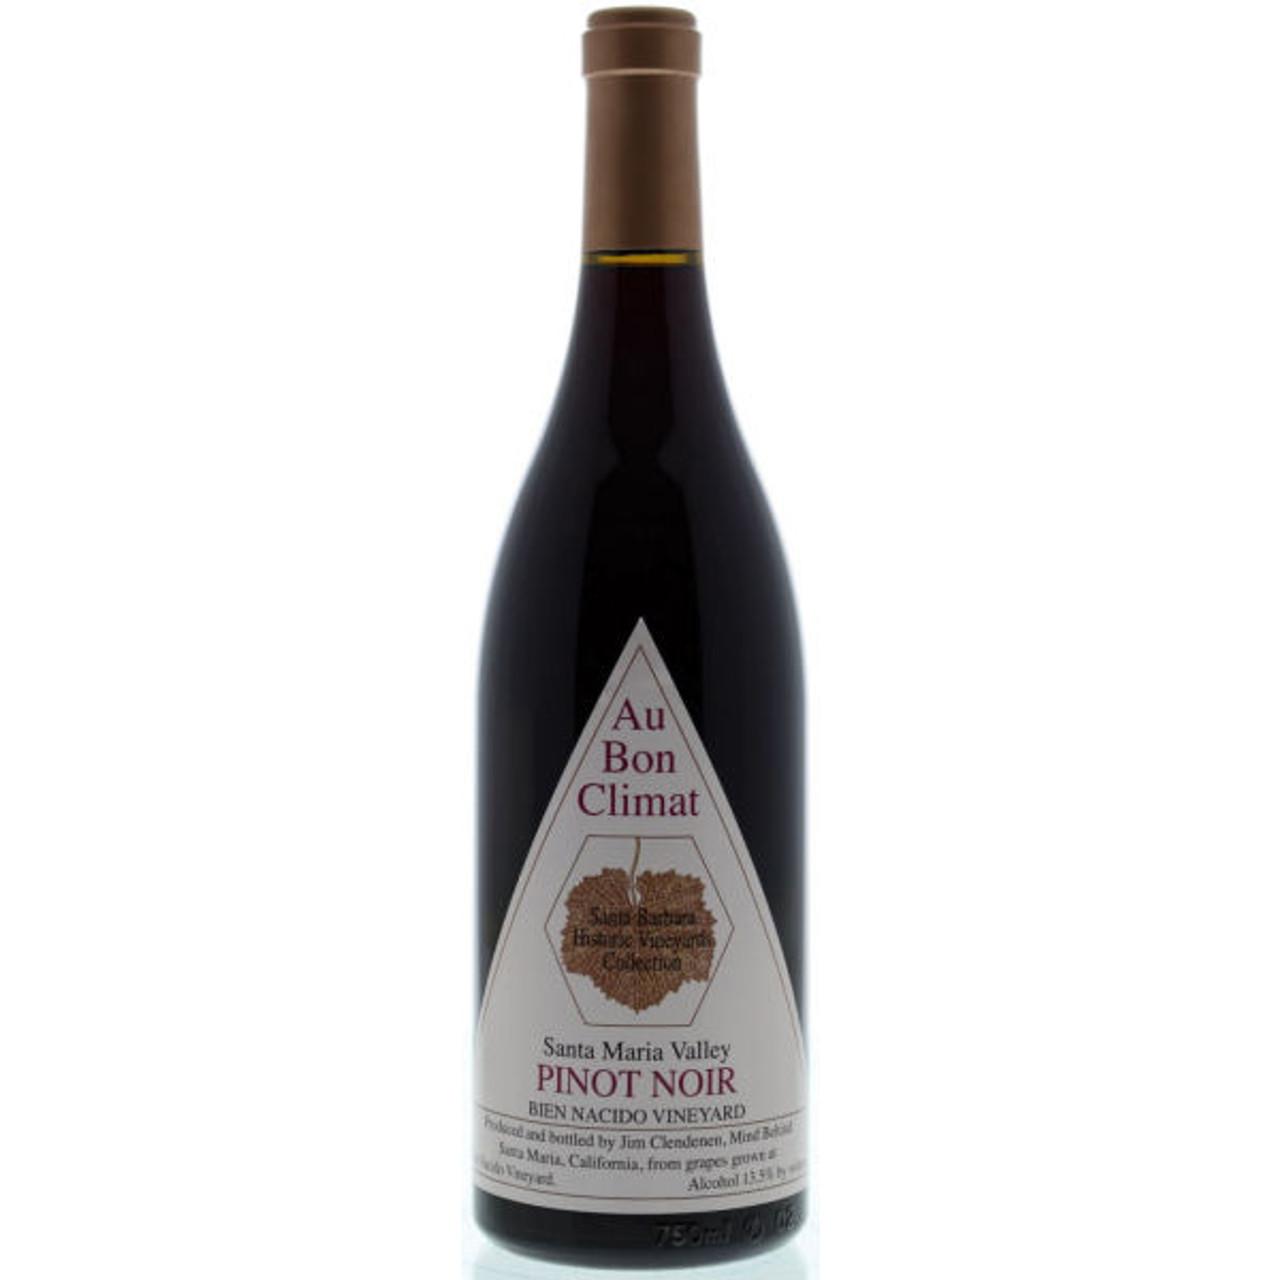 Au Bon Climat Bien Nacido Vineyard Santa Maria Pinot Noir